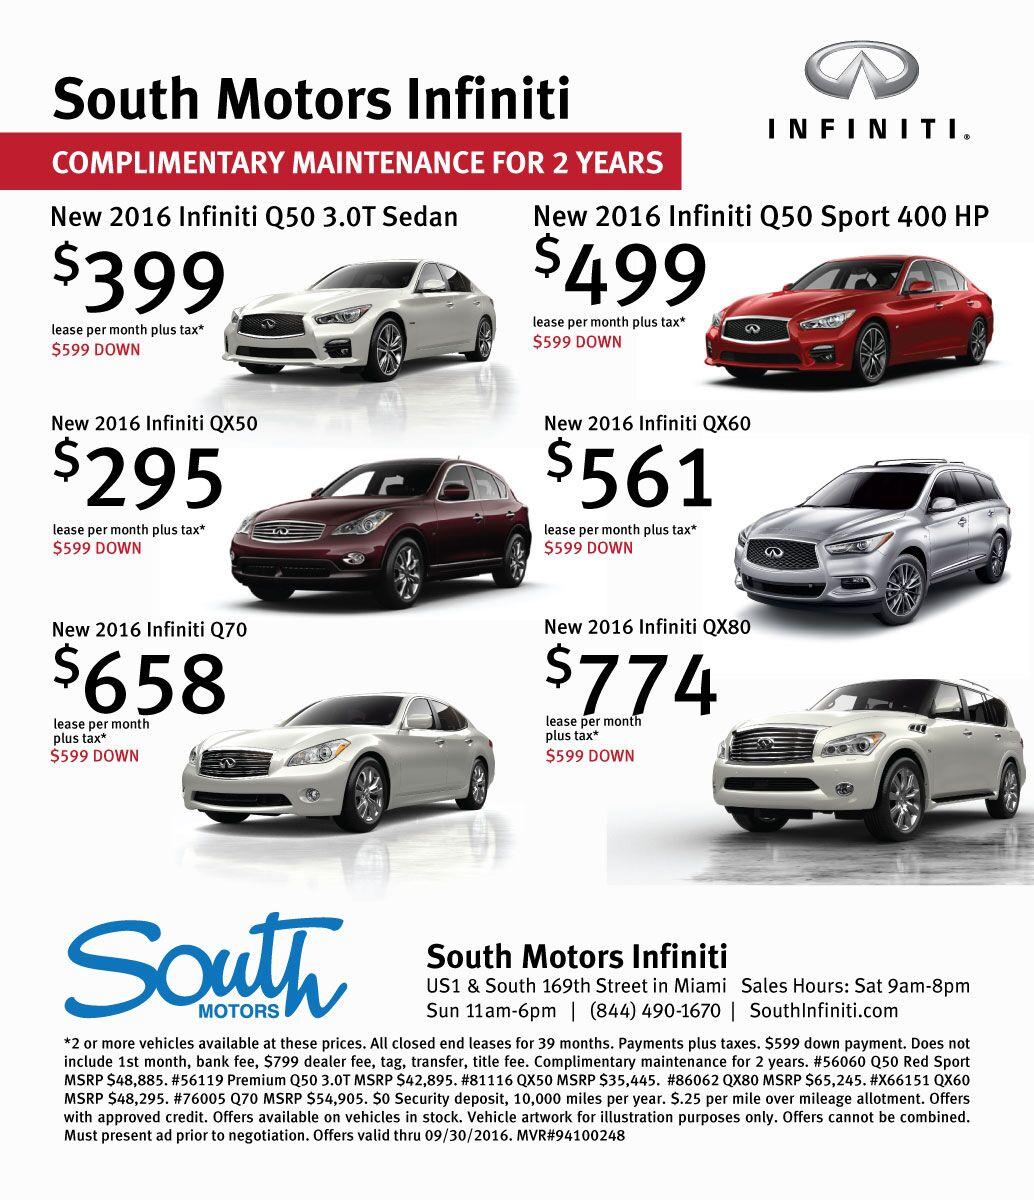 Miami Florida Infiniti Dealership South Motors Infiniti